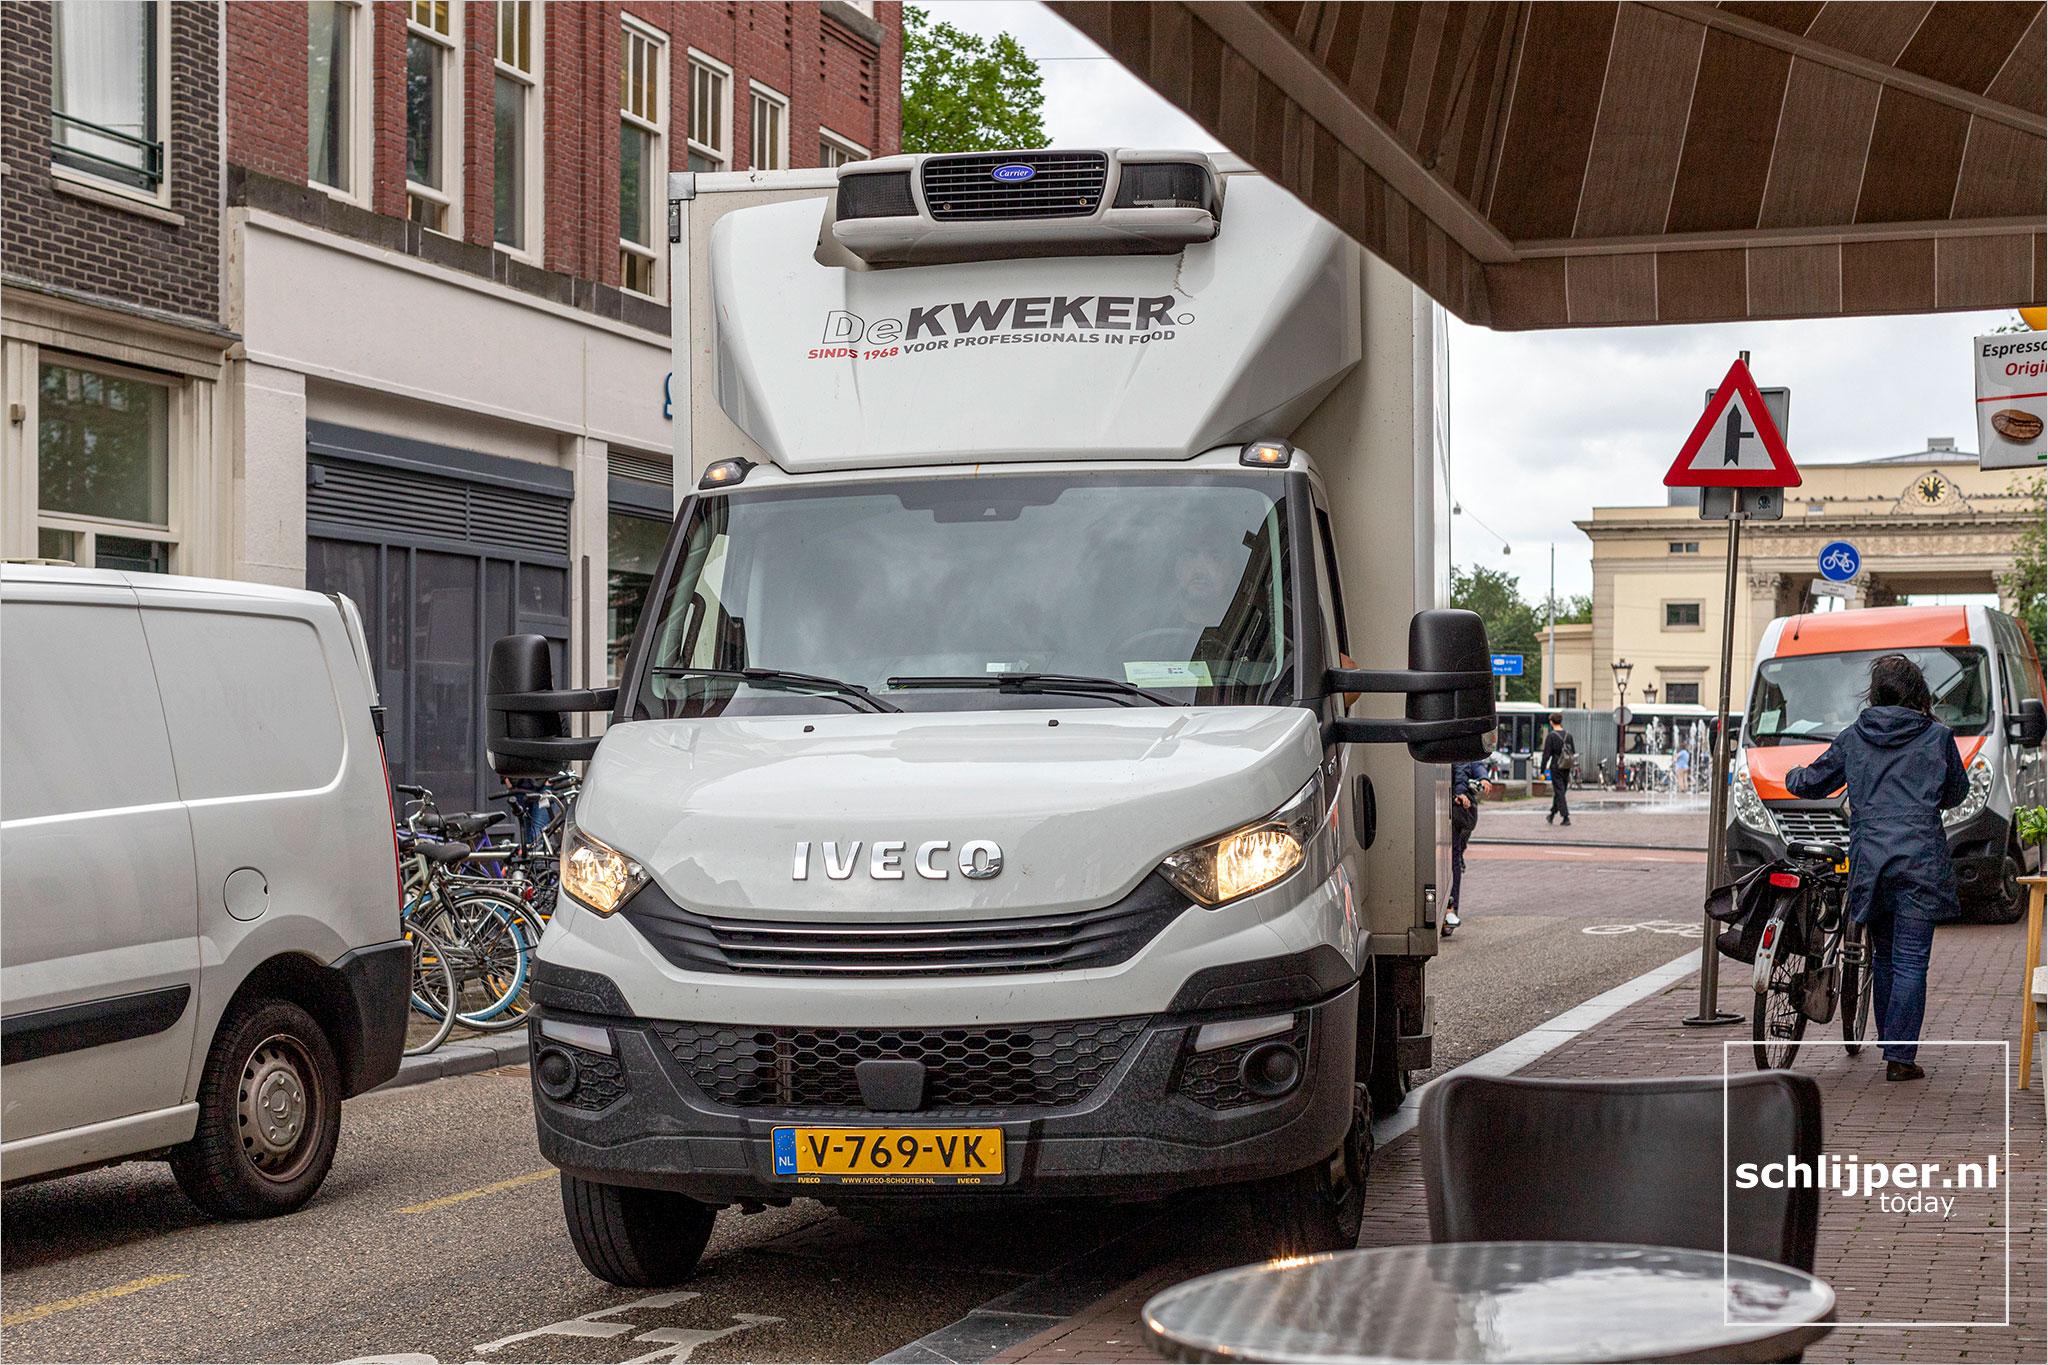 The Netherlands, Amsterdam, 5 juli 2021